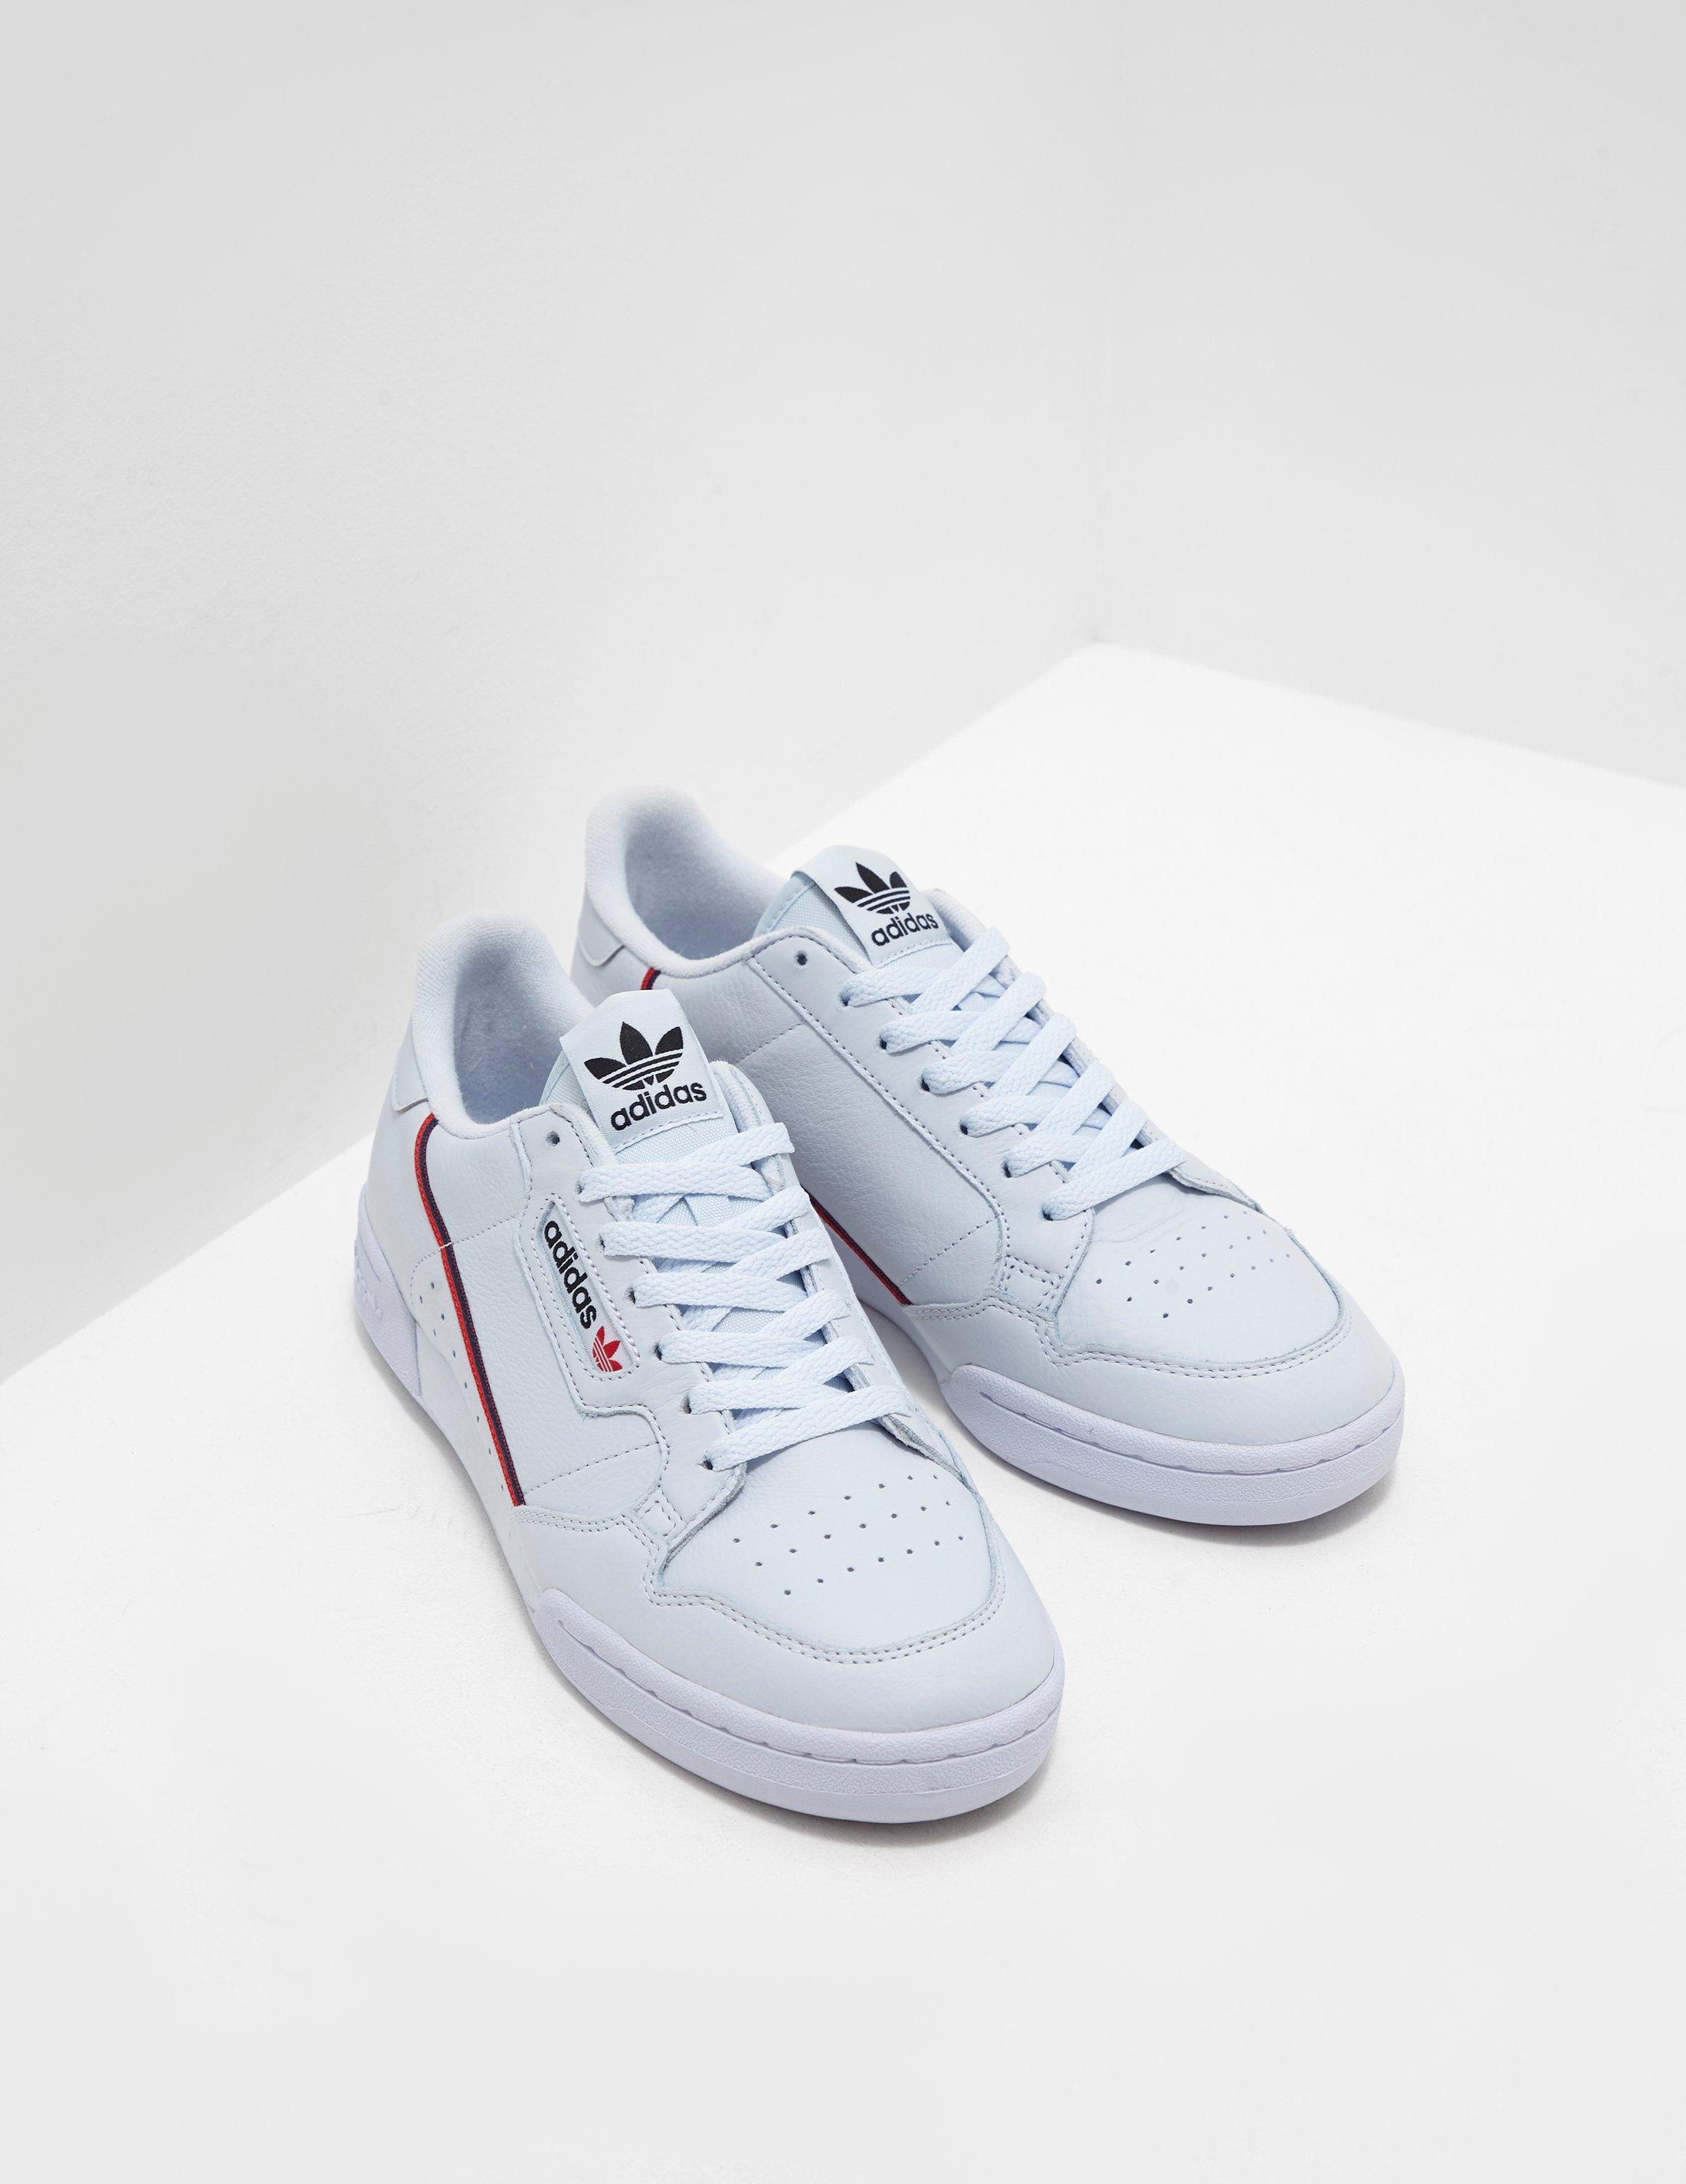 adidas Originals Continental 80 Blue in Blue for Men - Lyst 9d1b9d18b